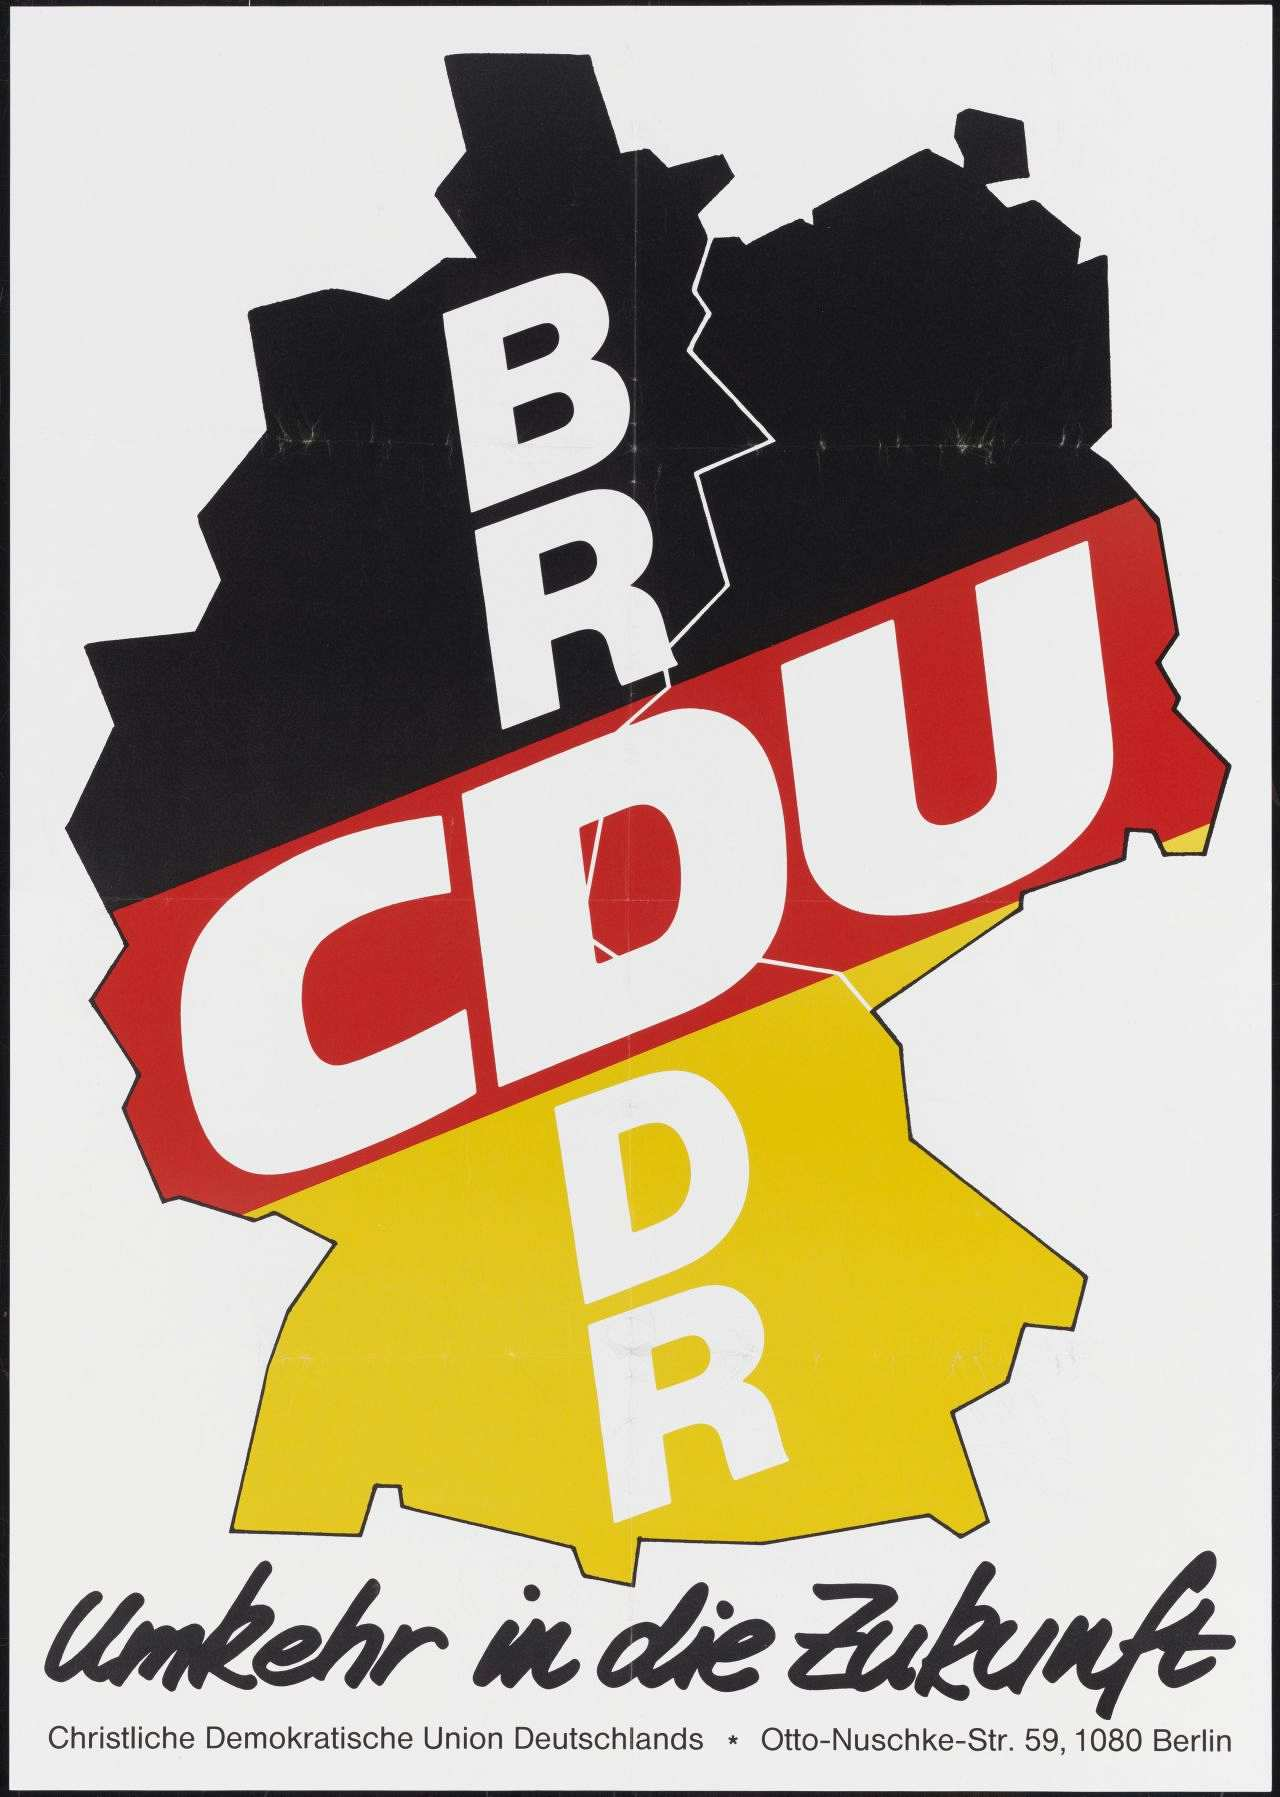 Cdu Plakat 1991